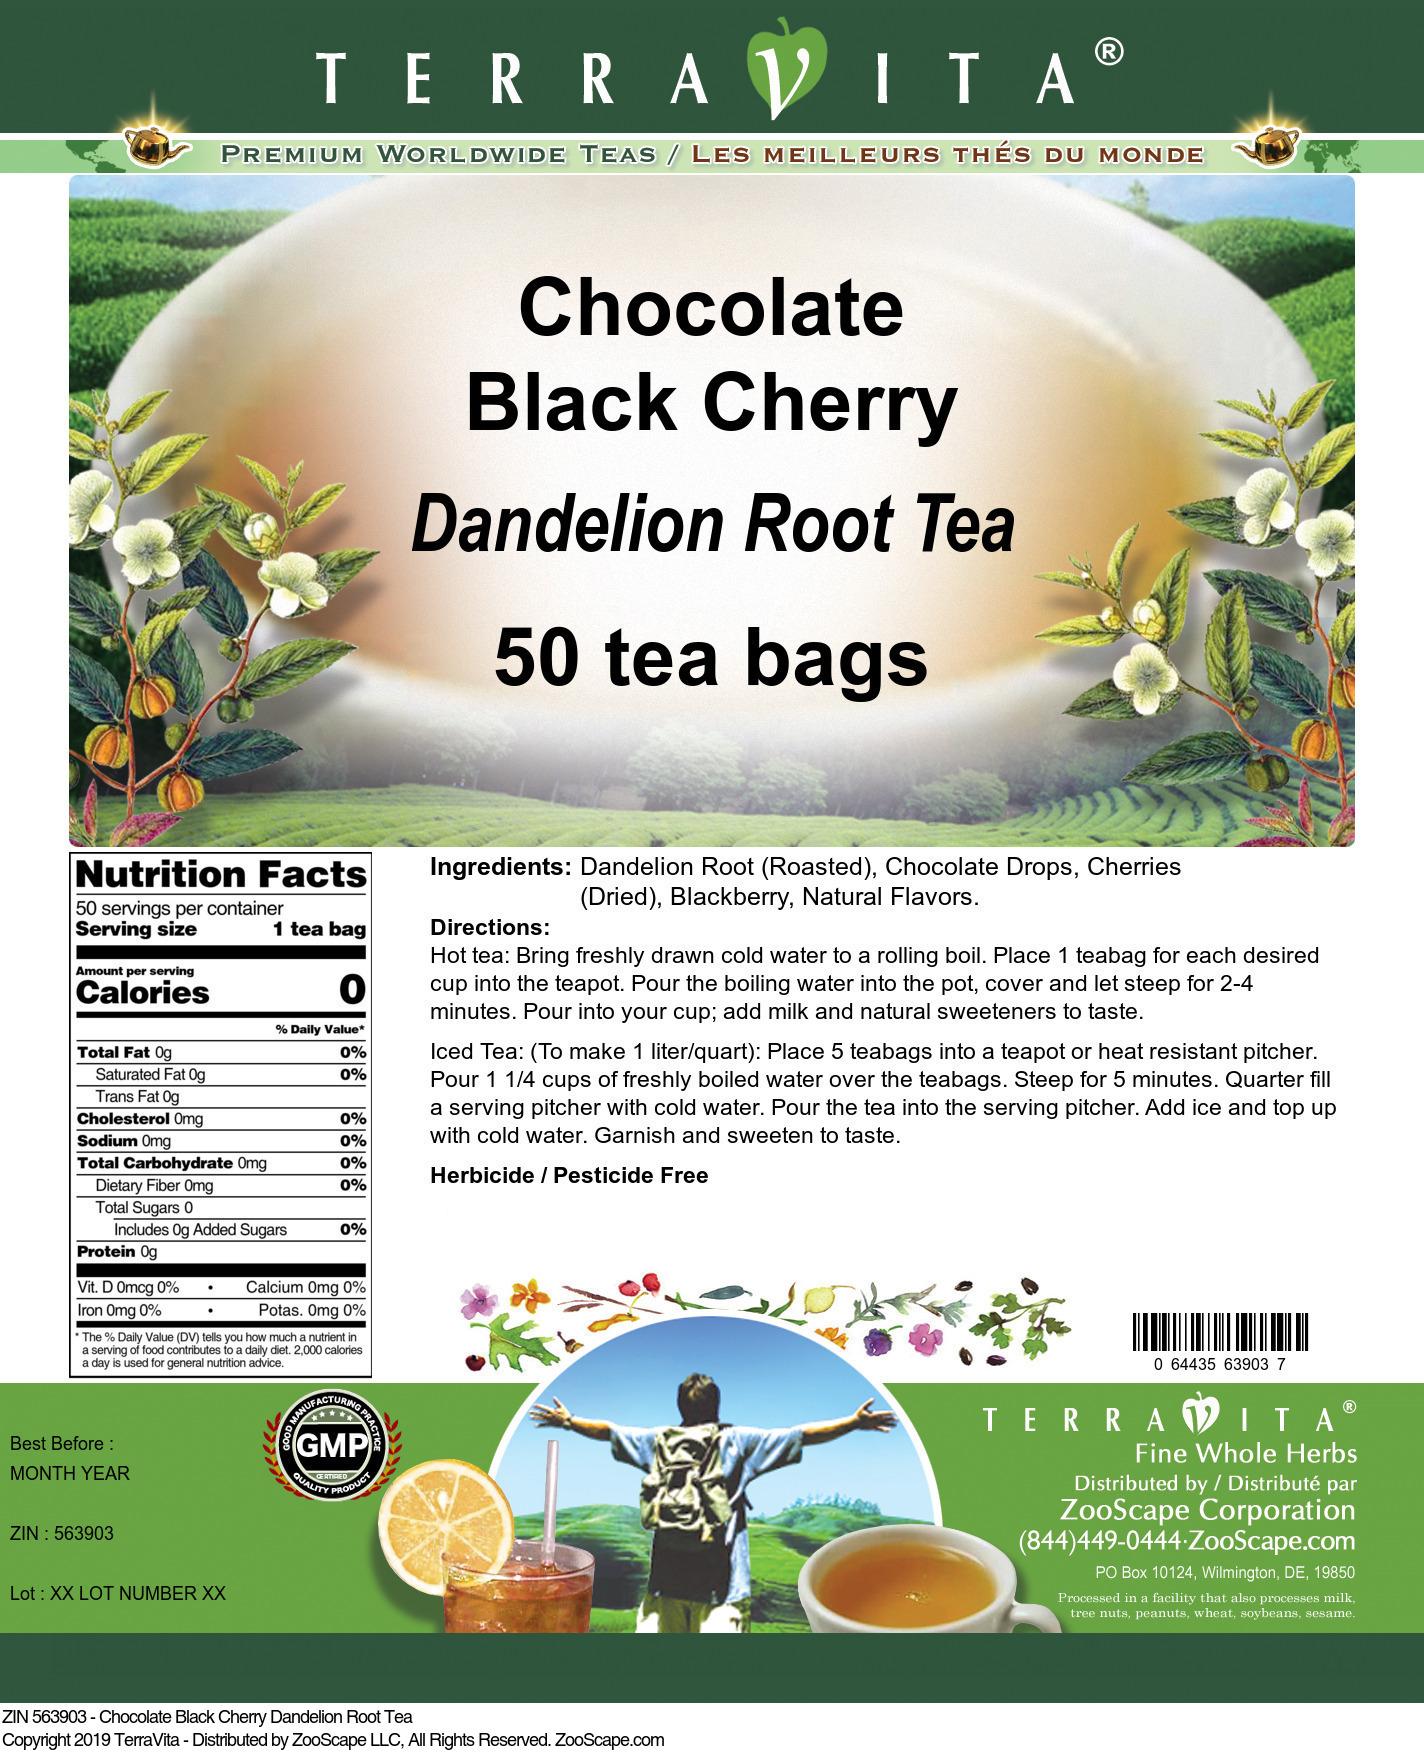 Chocolate Black Cherry Dandelion Root